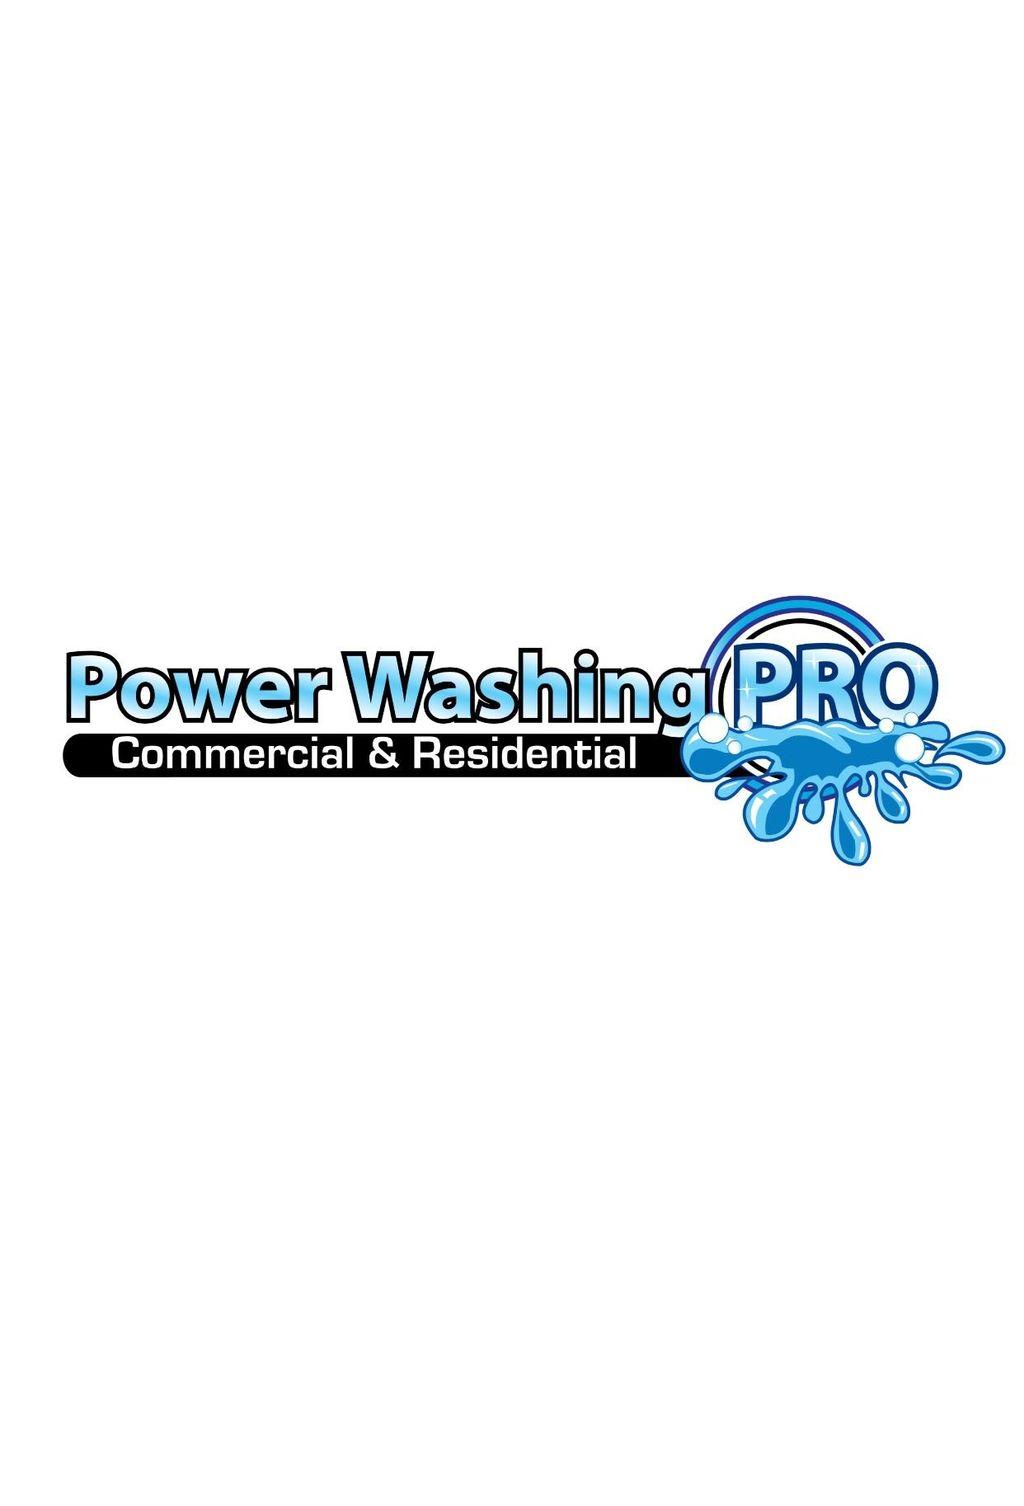 Power Washing Pro